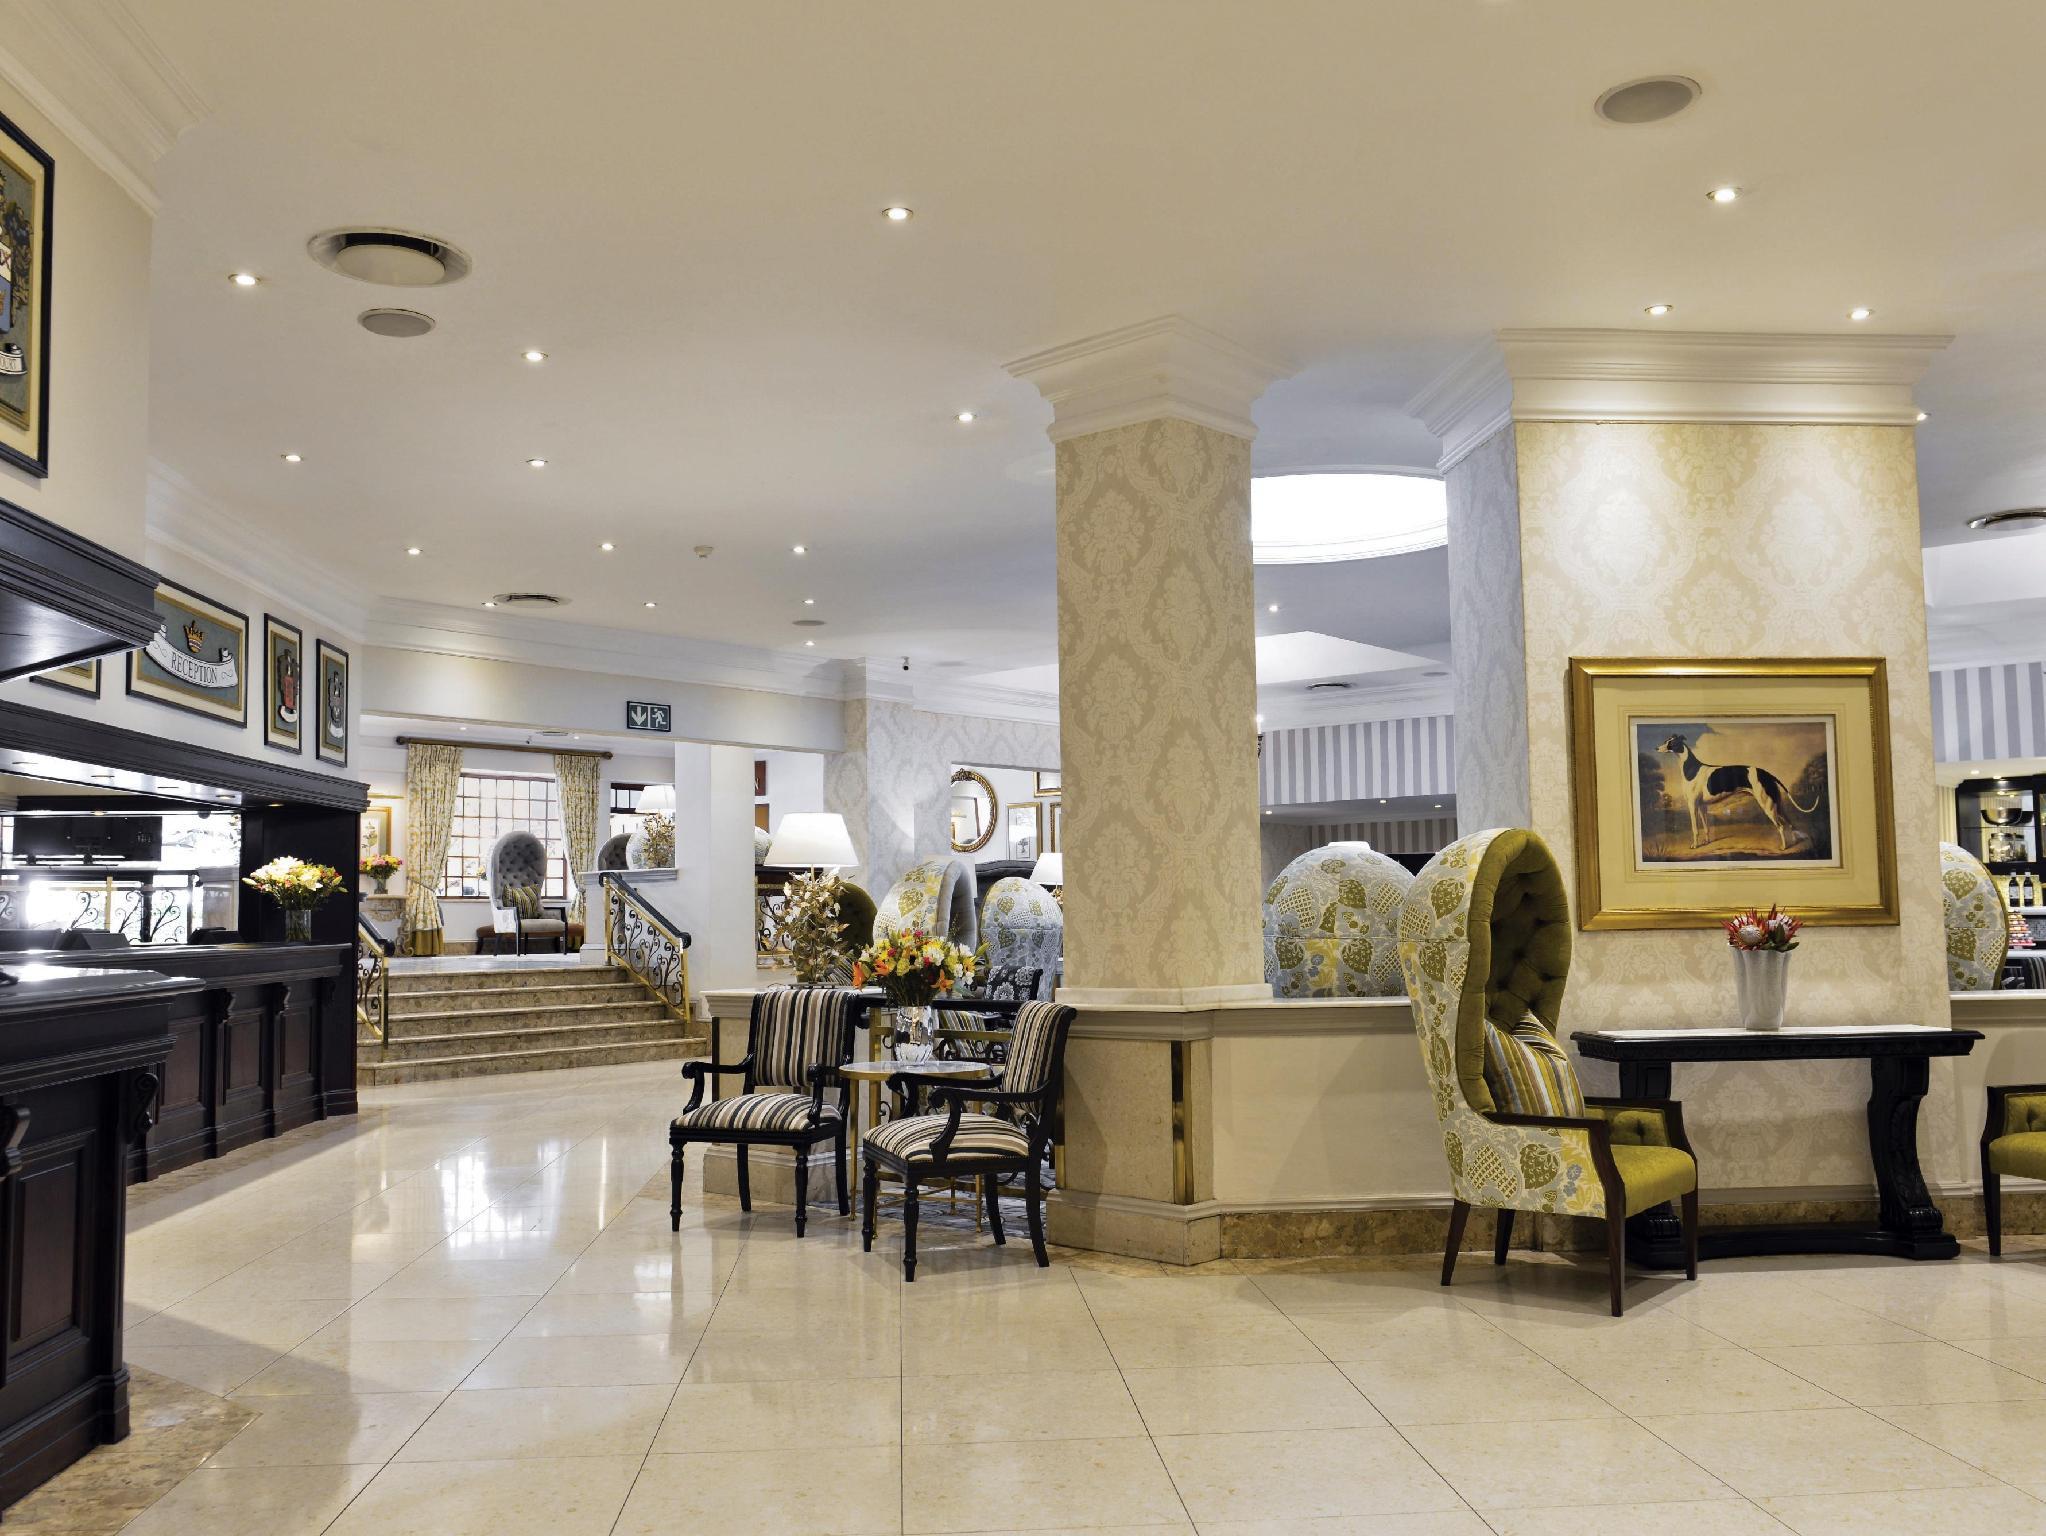 Protea Hotel Balalaika Sandton